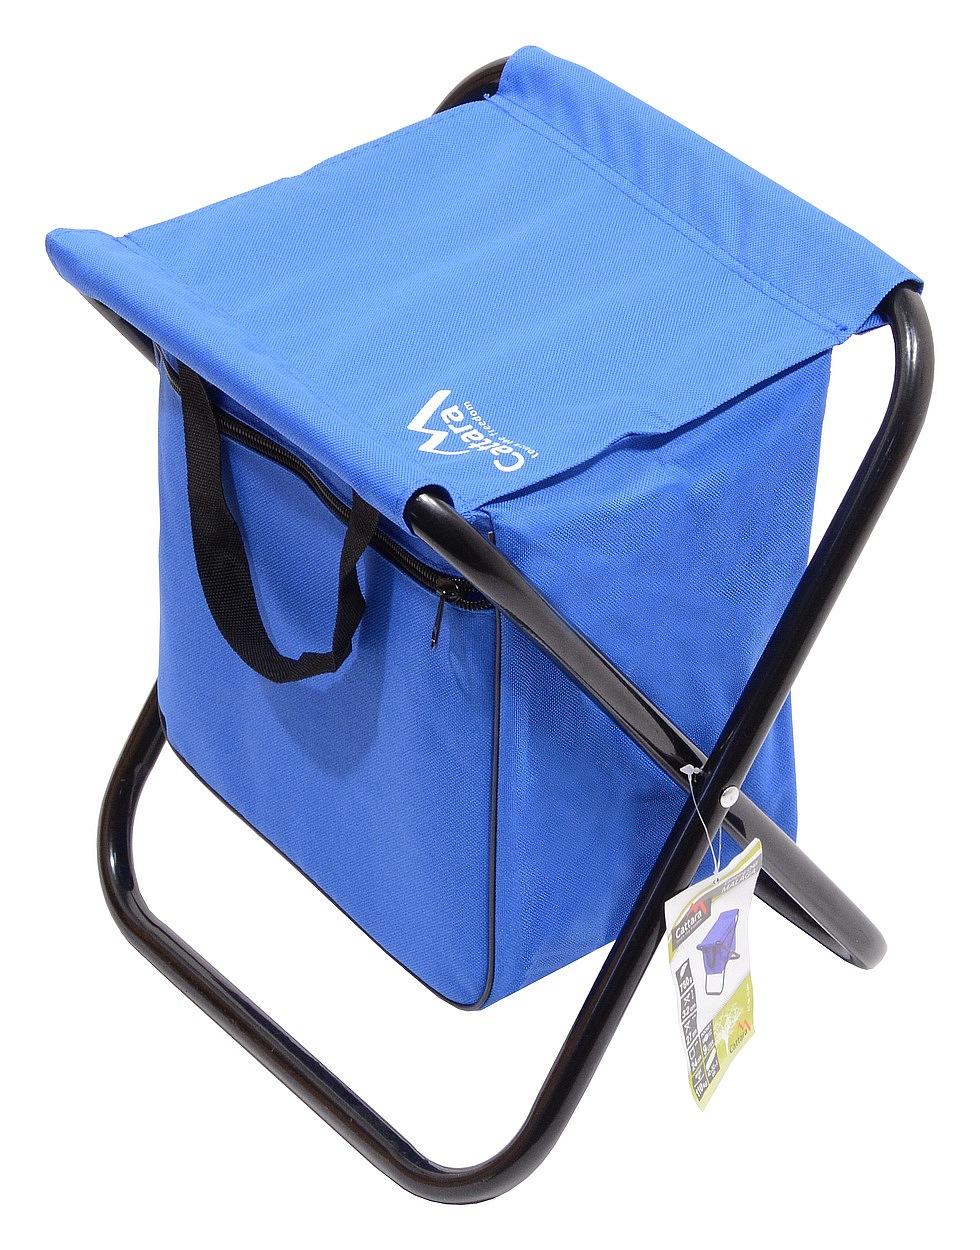 Cattara - Židle kempingová skládací MALAGA modrá